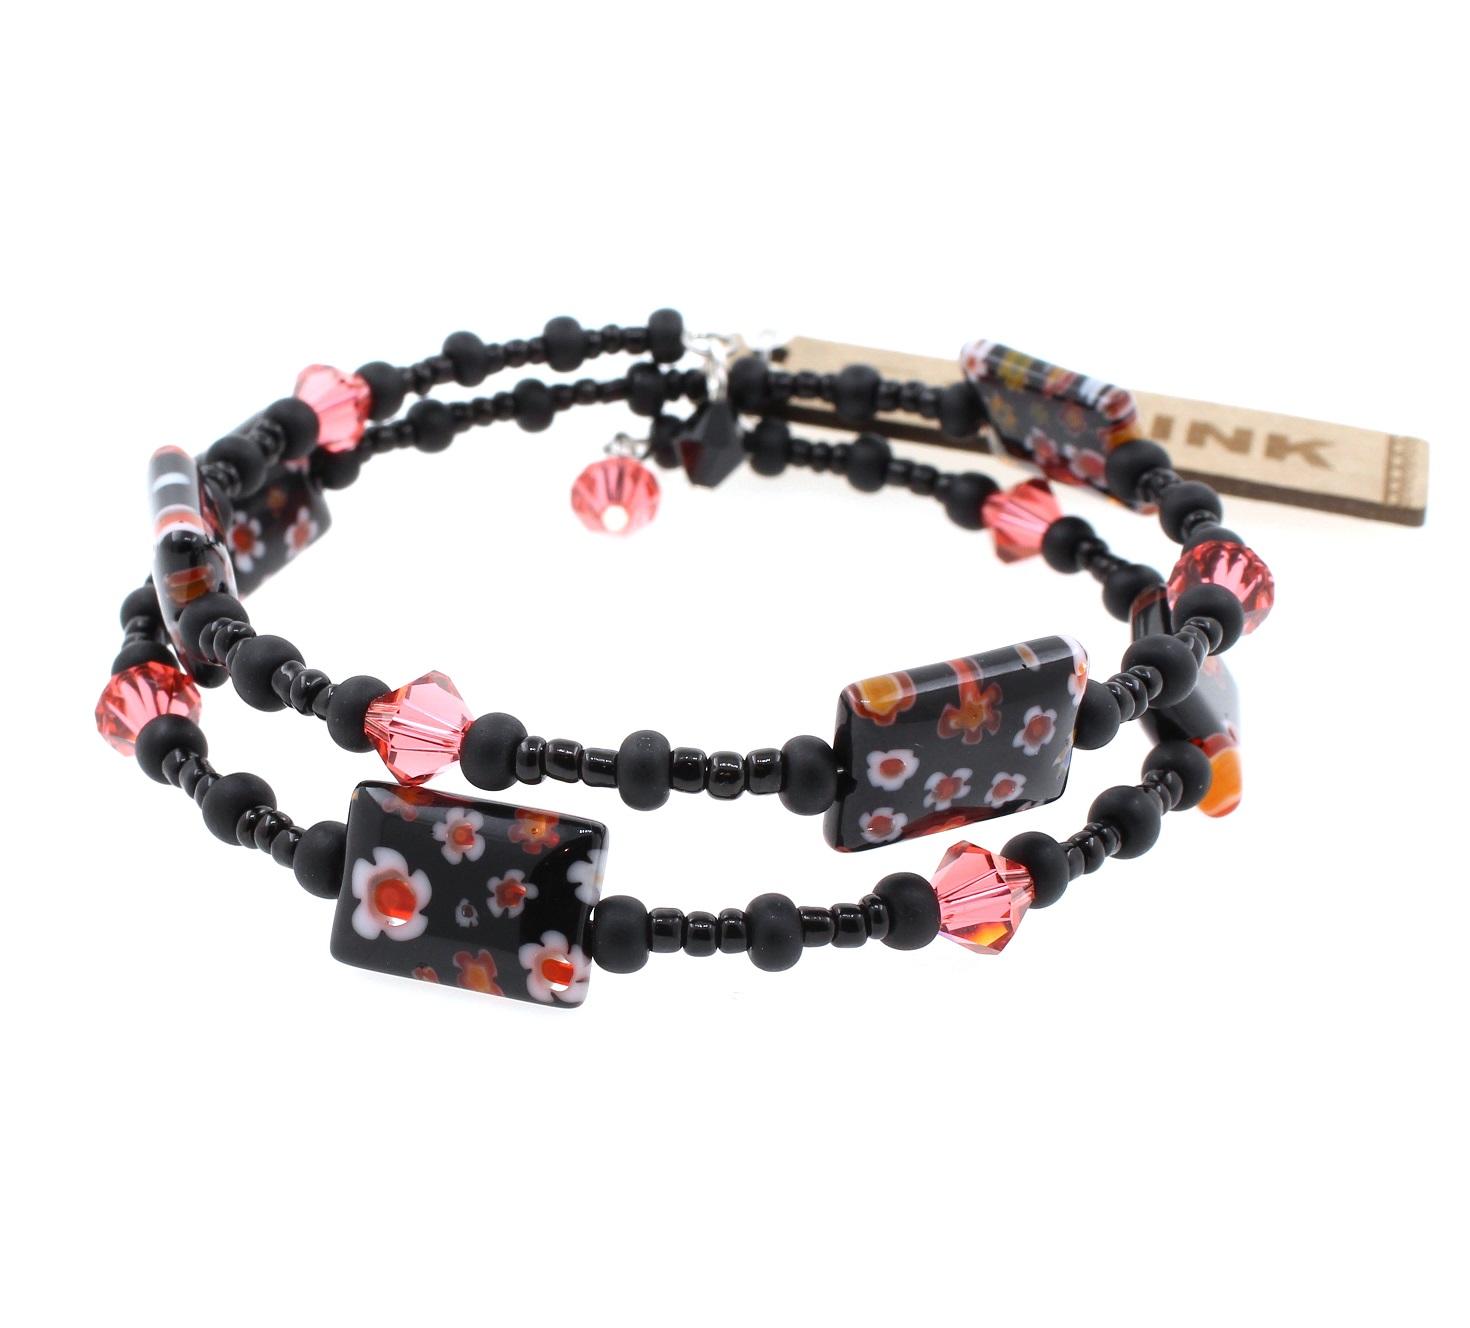 Padparadscha Swarovski & Black Themed Palette - 2 Loop Wrap Bracelet